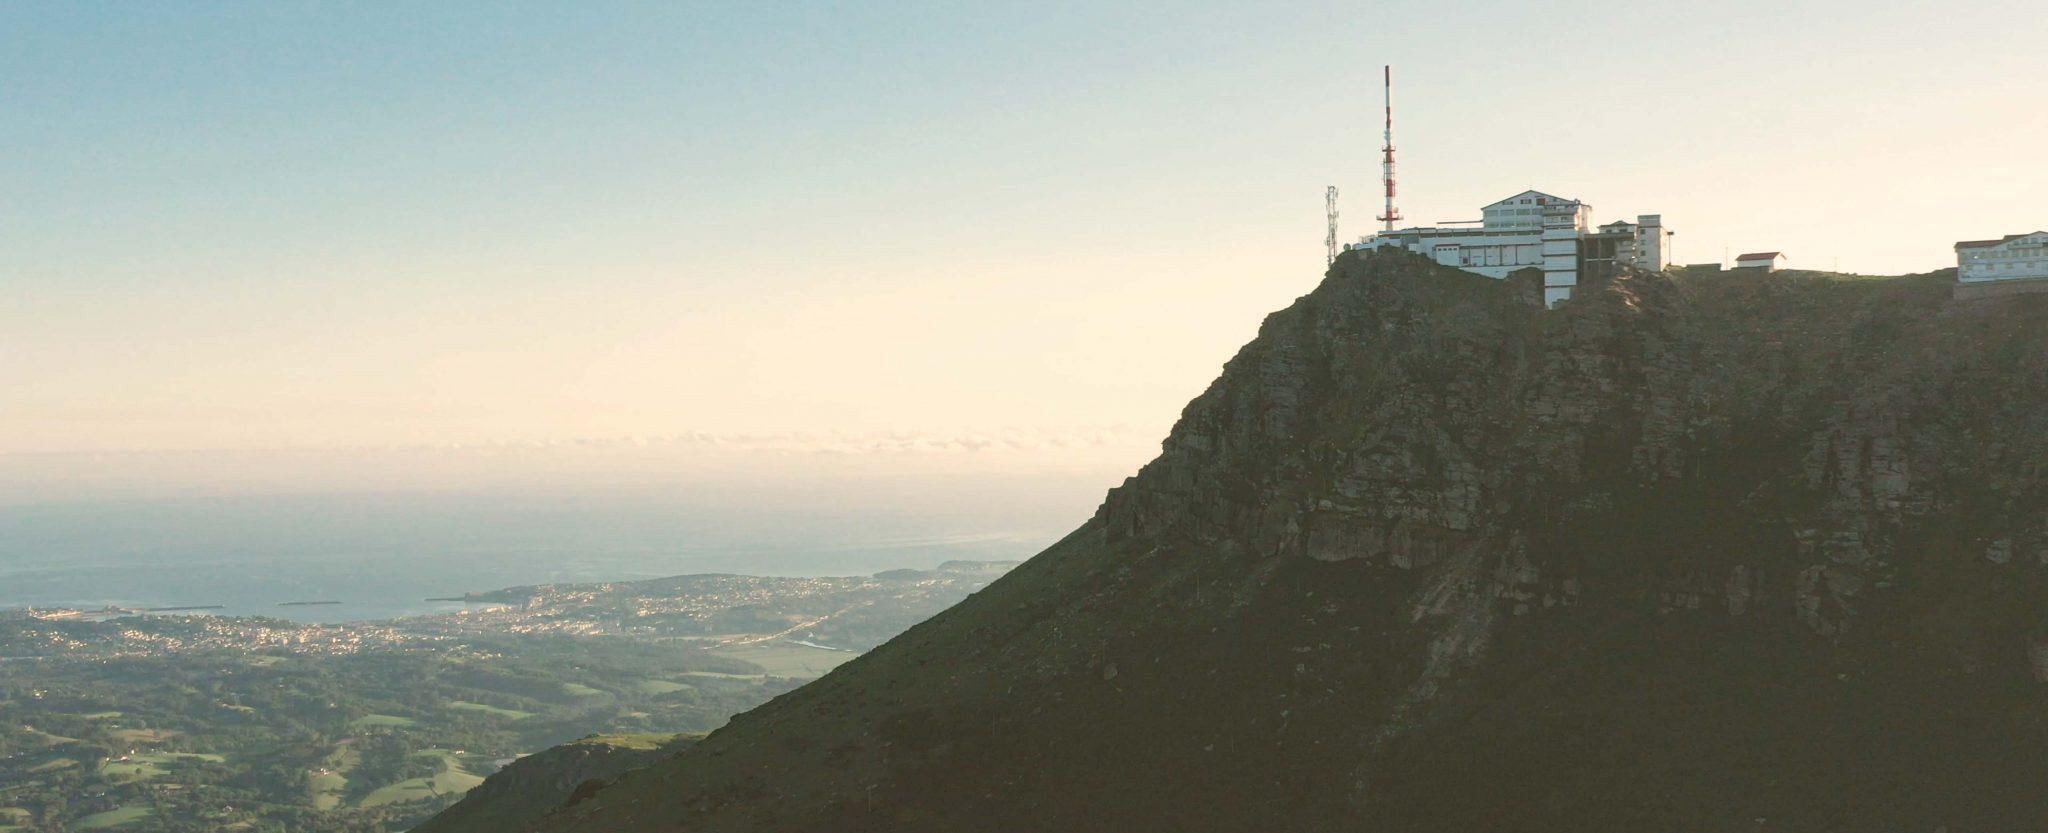 drone-rhune-montagne-pierre-frechou-mringalss-films-pays-basque